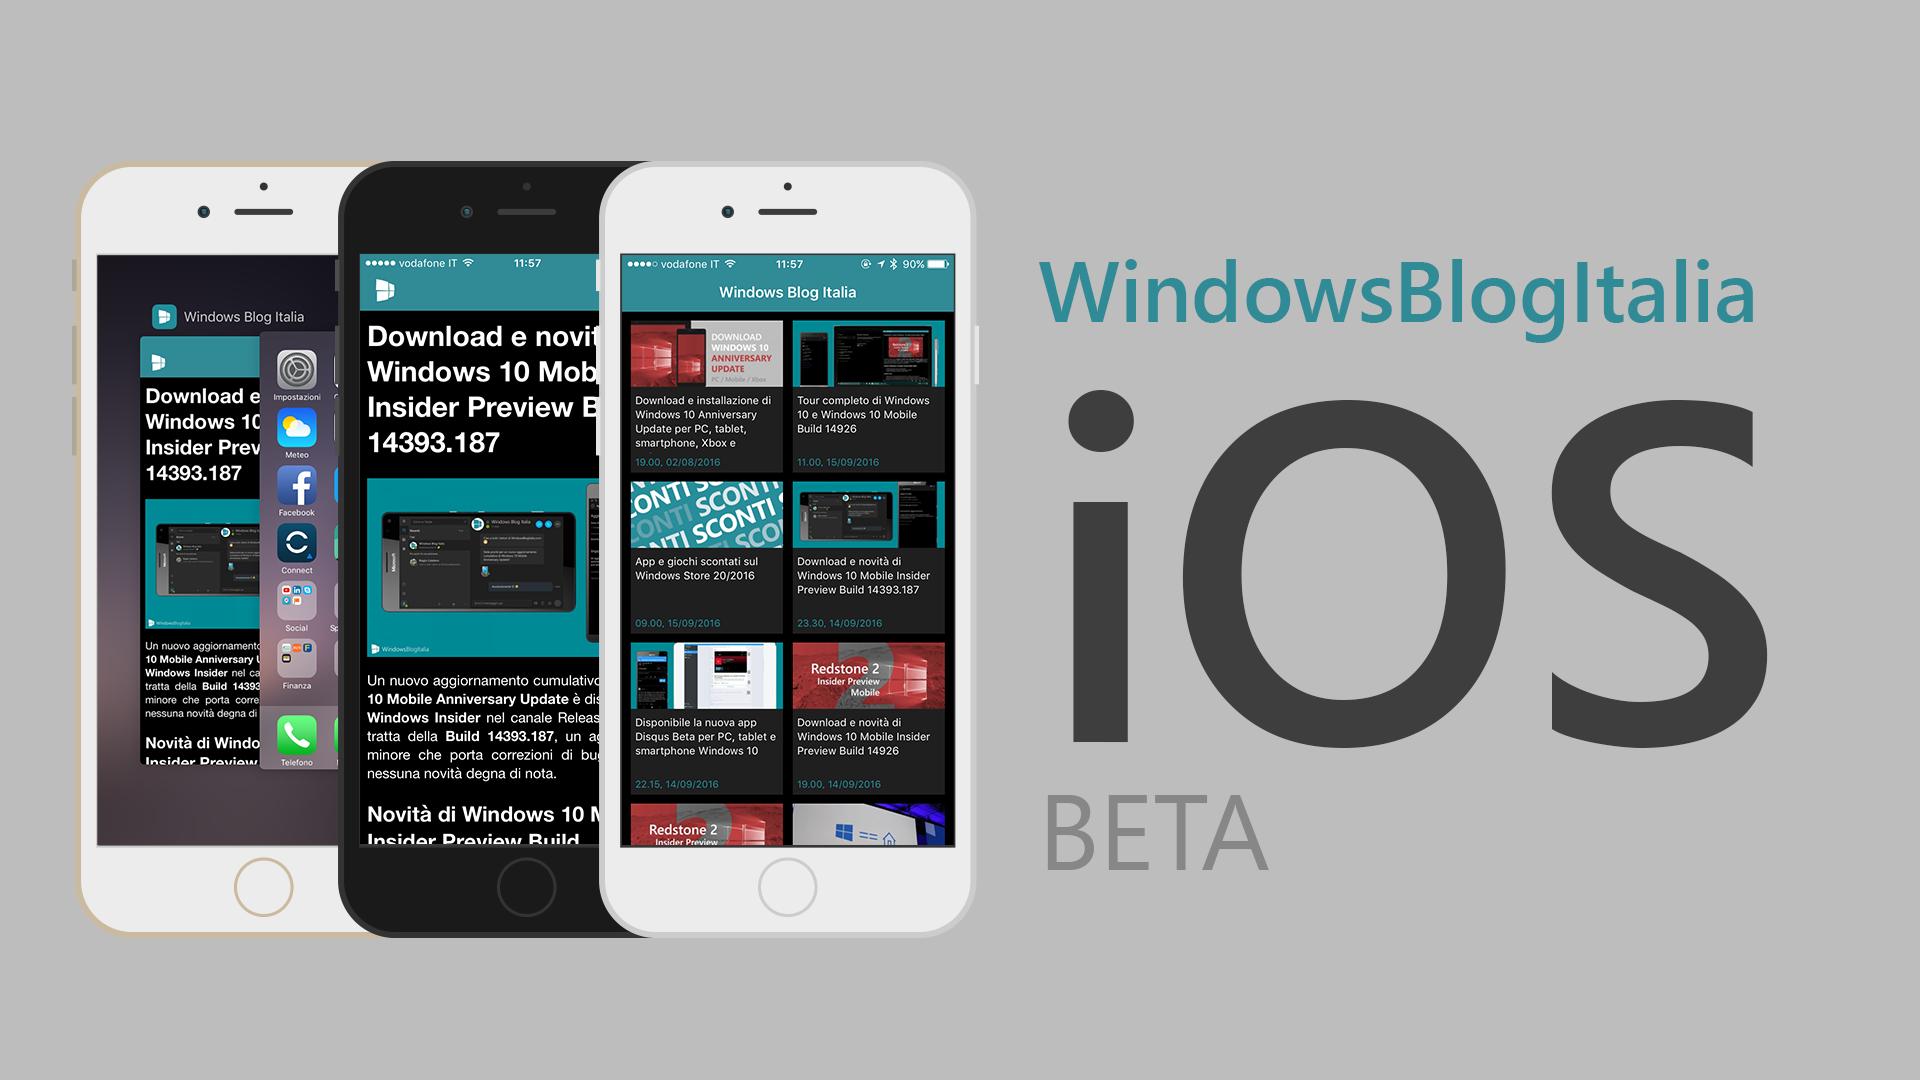 app-windowsblogitalia-ios